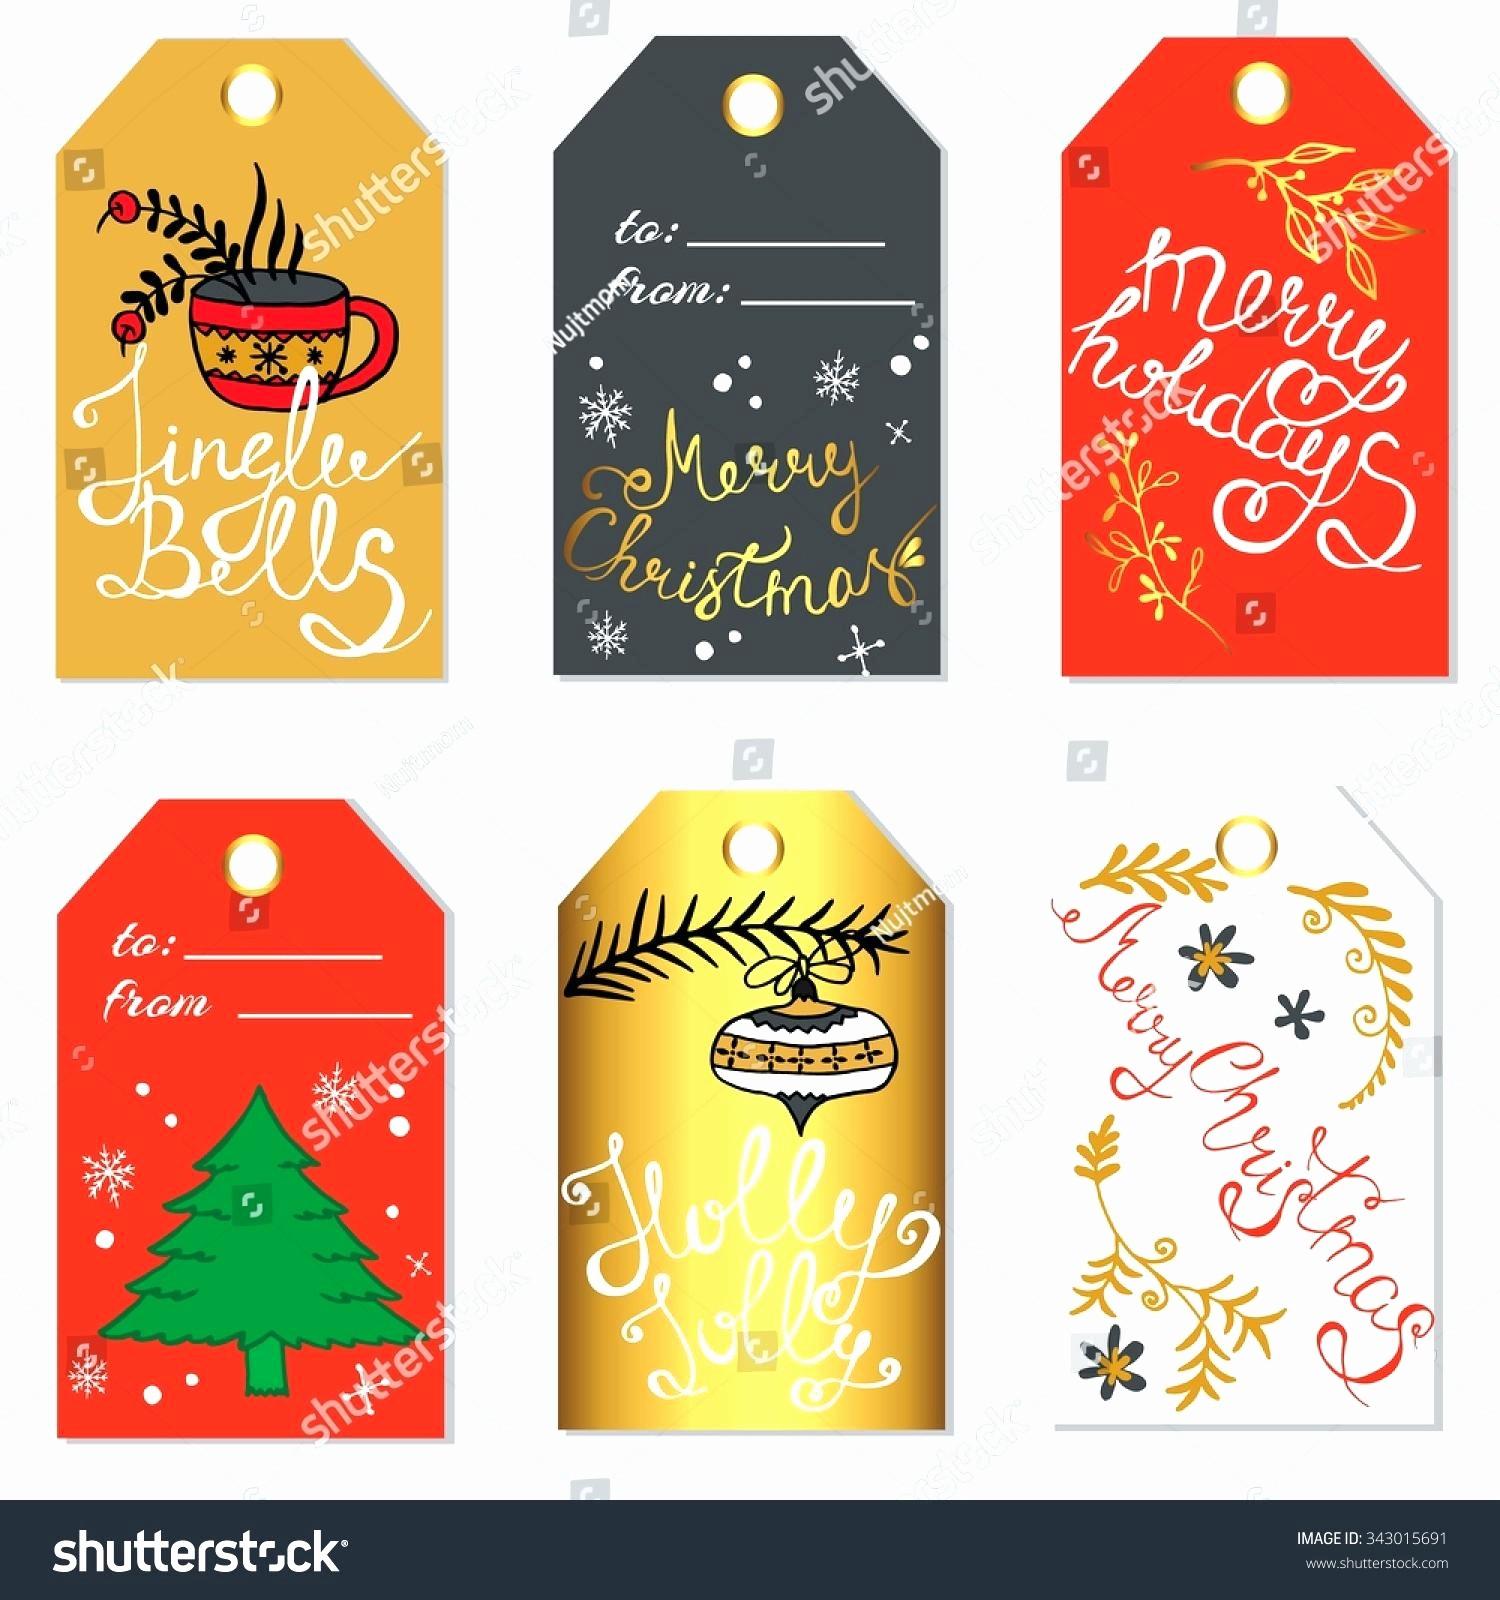 Christmas Gift Tags Template Free Beautiful Christmas Gift Labels Template